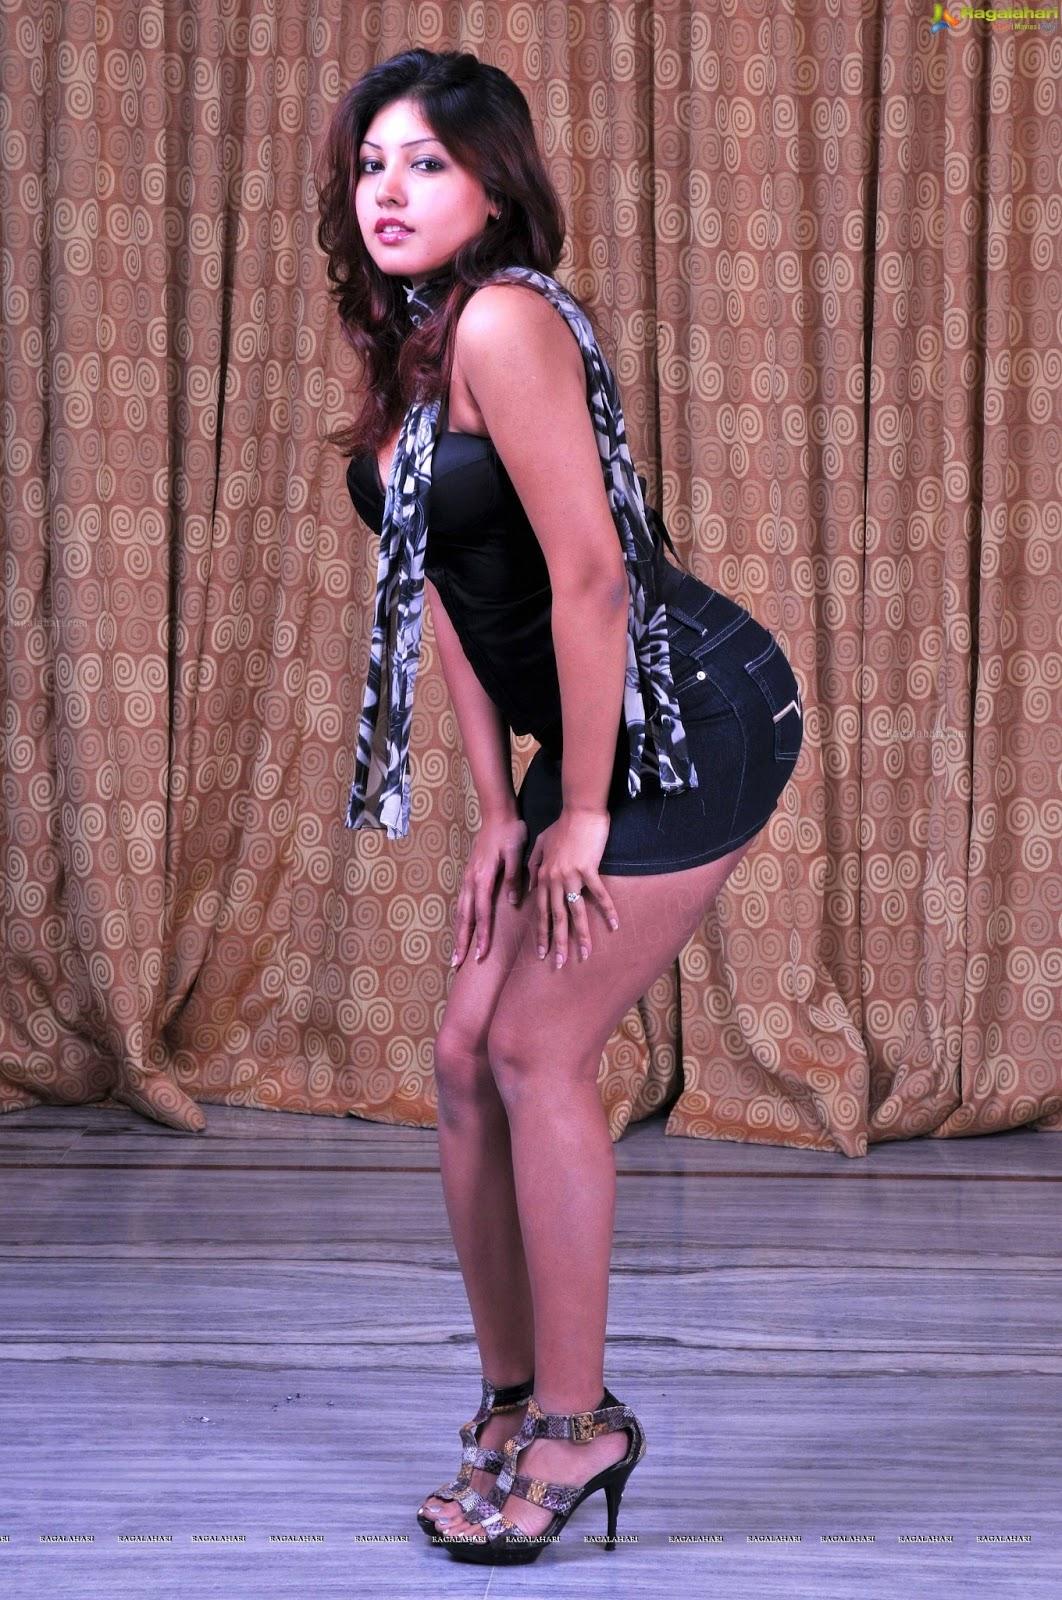 Komal Jha Latest Hot Photoshoot Stills - Cinema65 Gallery